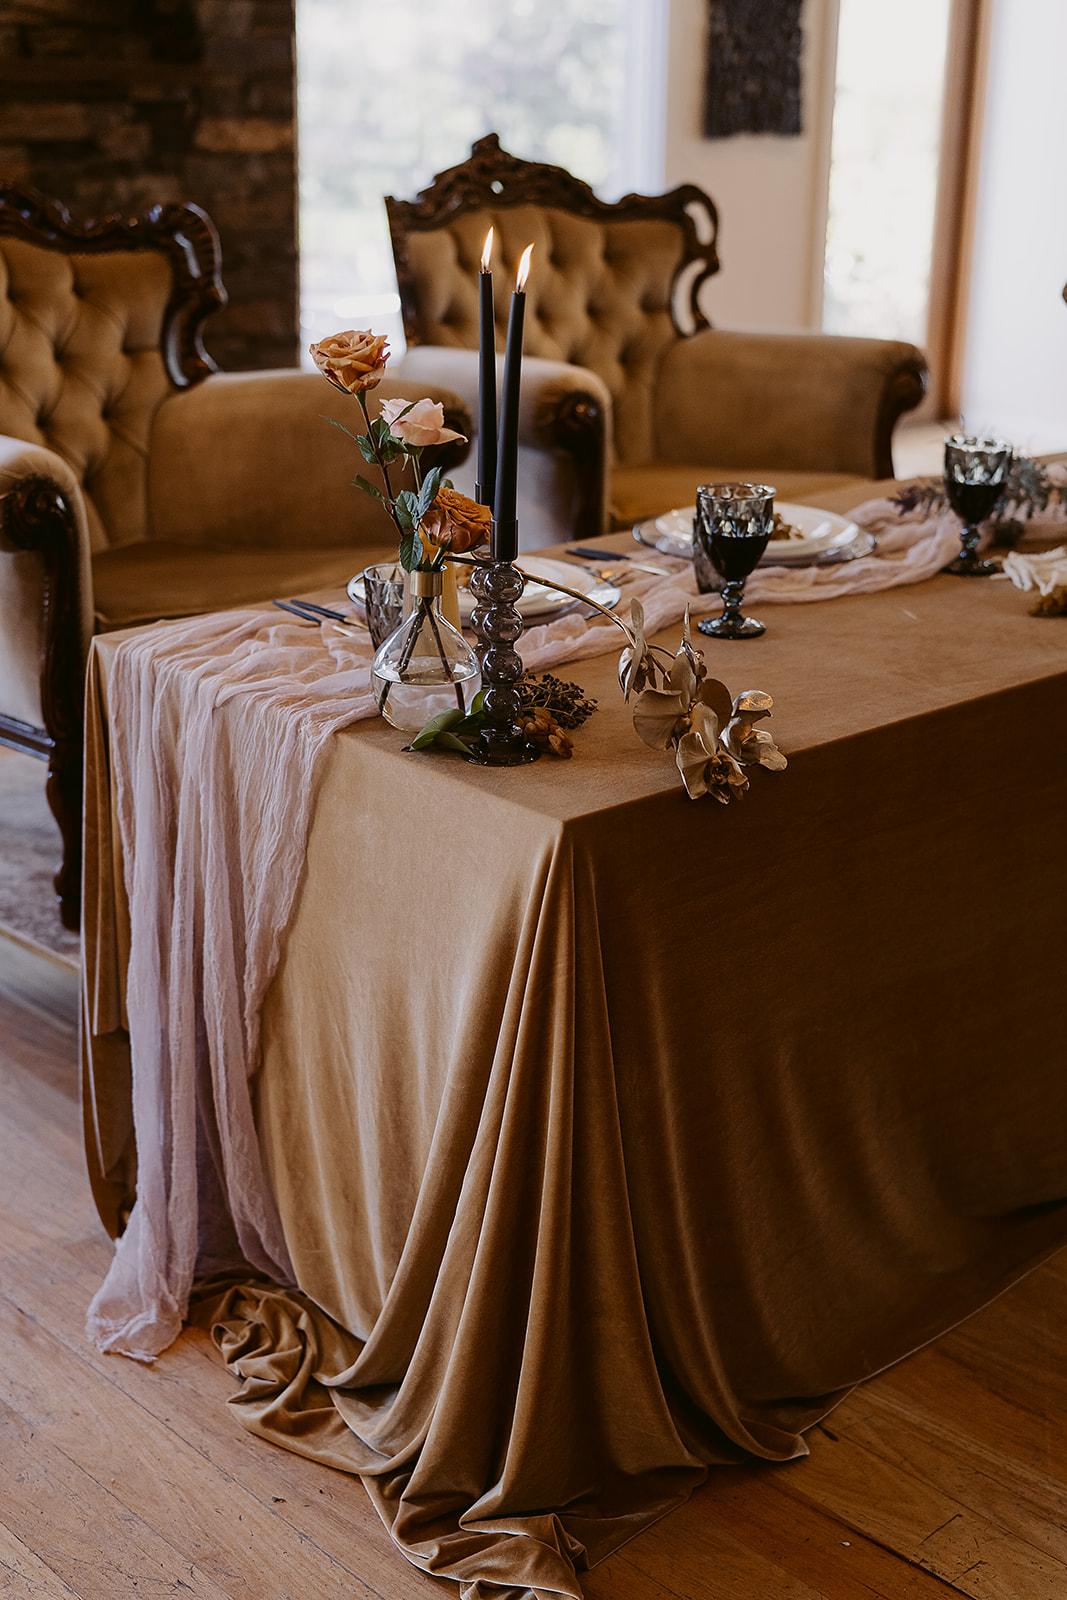 Immerse_Yarra_Valley_Same_Sex_Wedding_-_Ashleigh_Haase_Photography-738.jpg